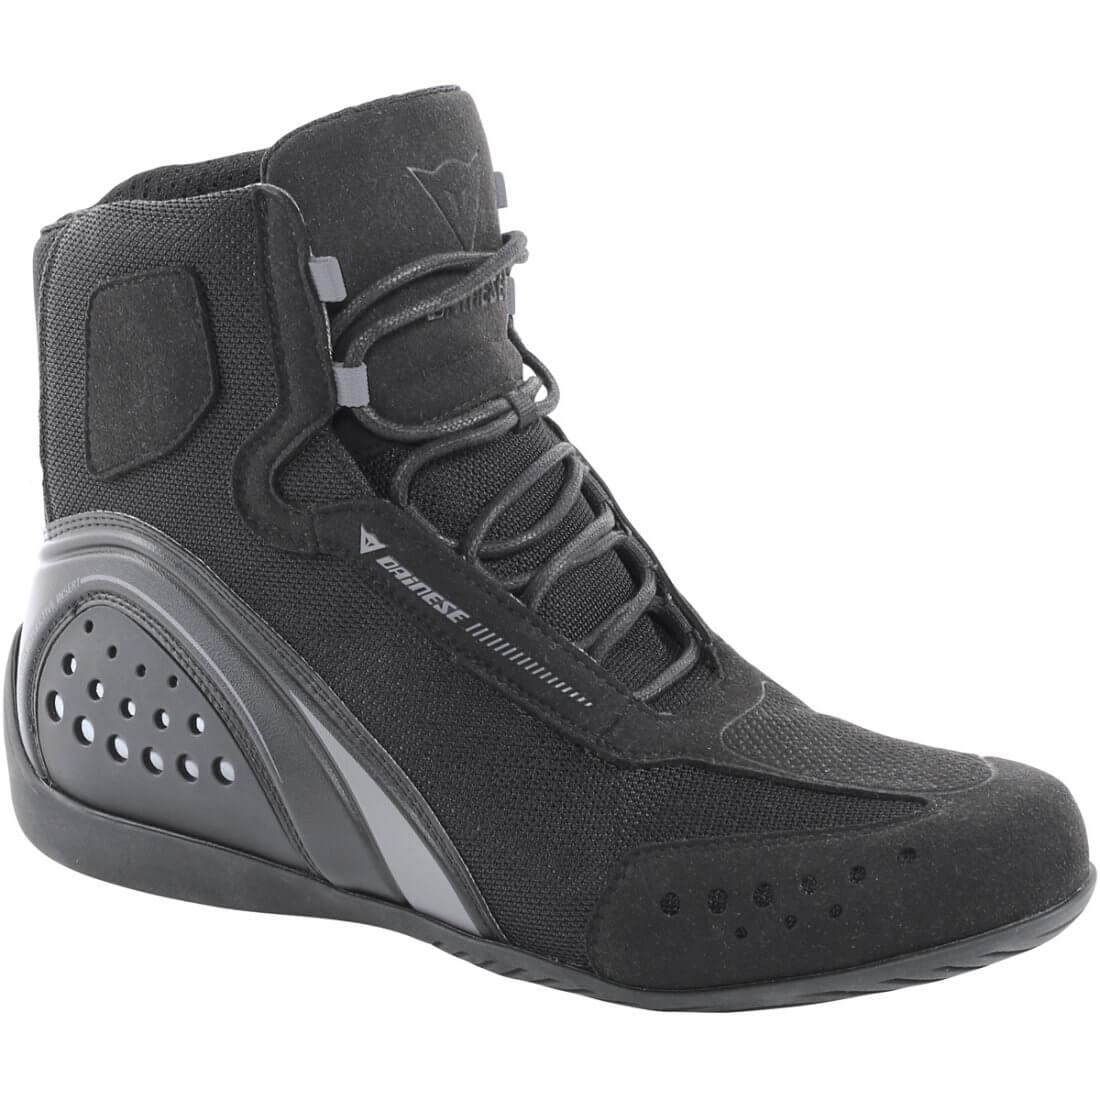 Dainese čevlji Motorshoe Air JB